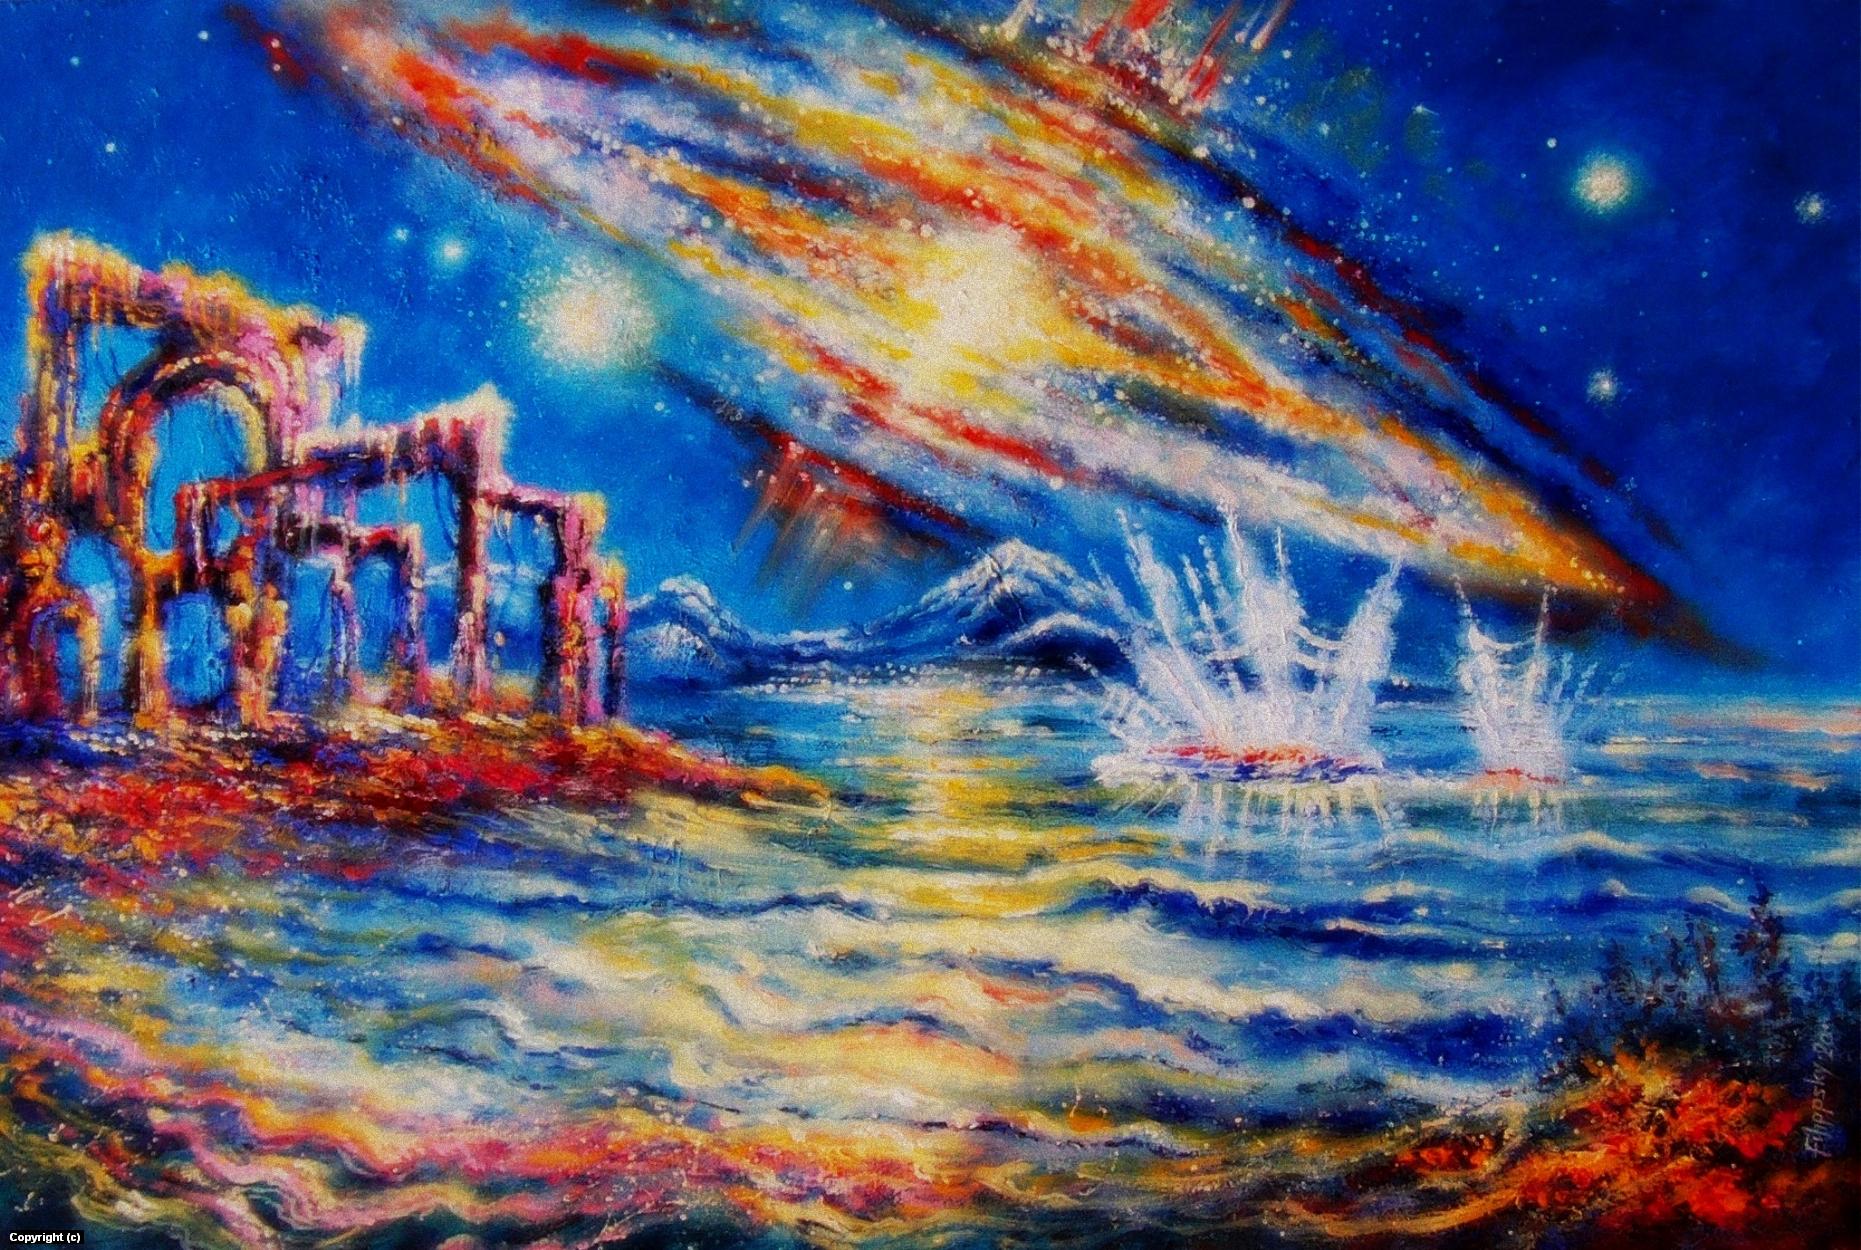 On the shores of a strange ocean. Artwork by Victor Filippsky